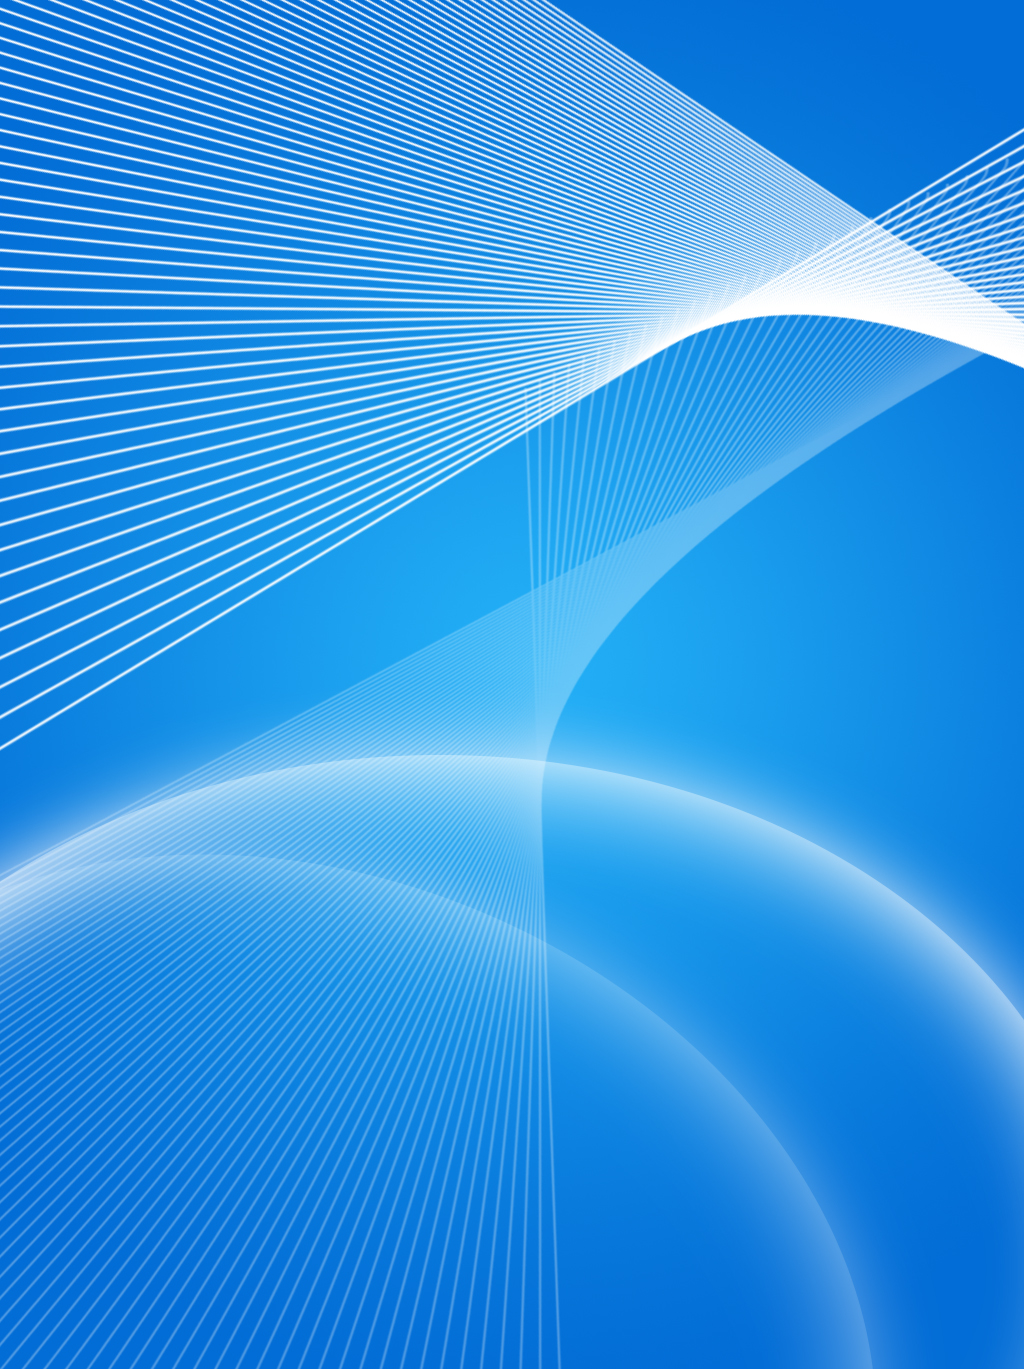 fond bleu sens simple et technologique simple bleu d u00e9grad u00e9